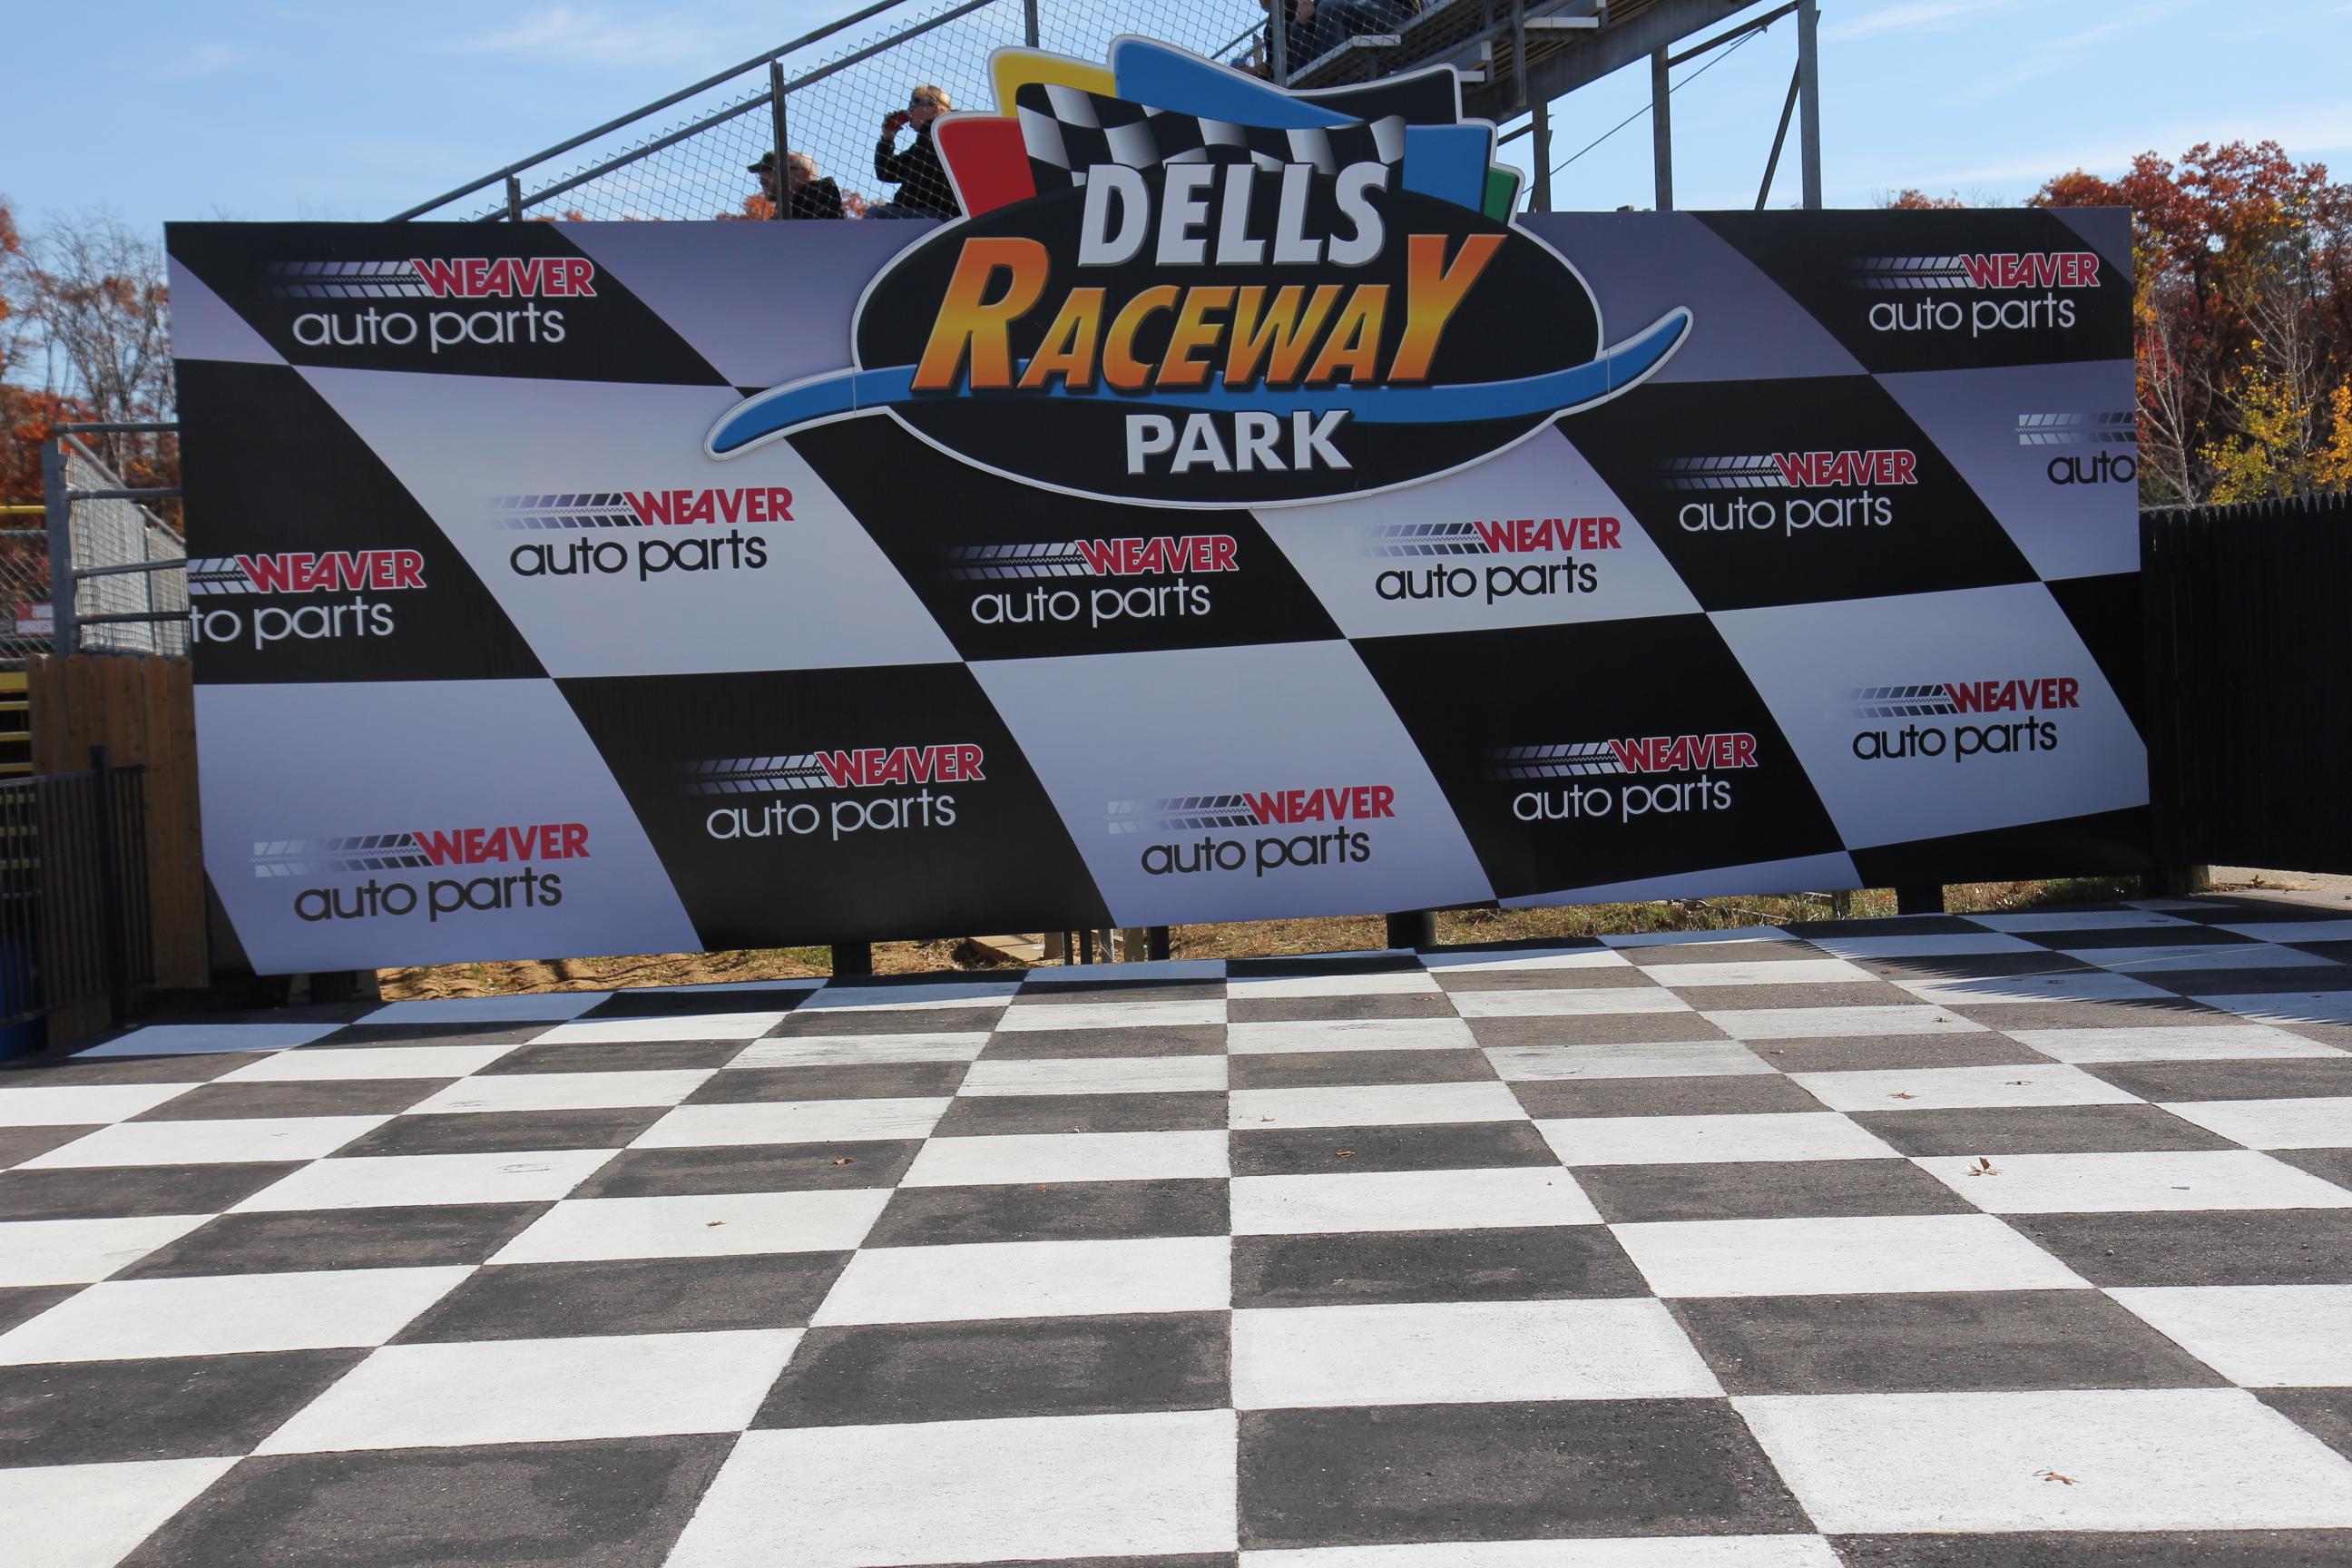 File:Dells Raceway Park Victory Lane.jpg - Wikimedia Commons